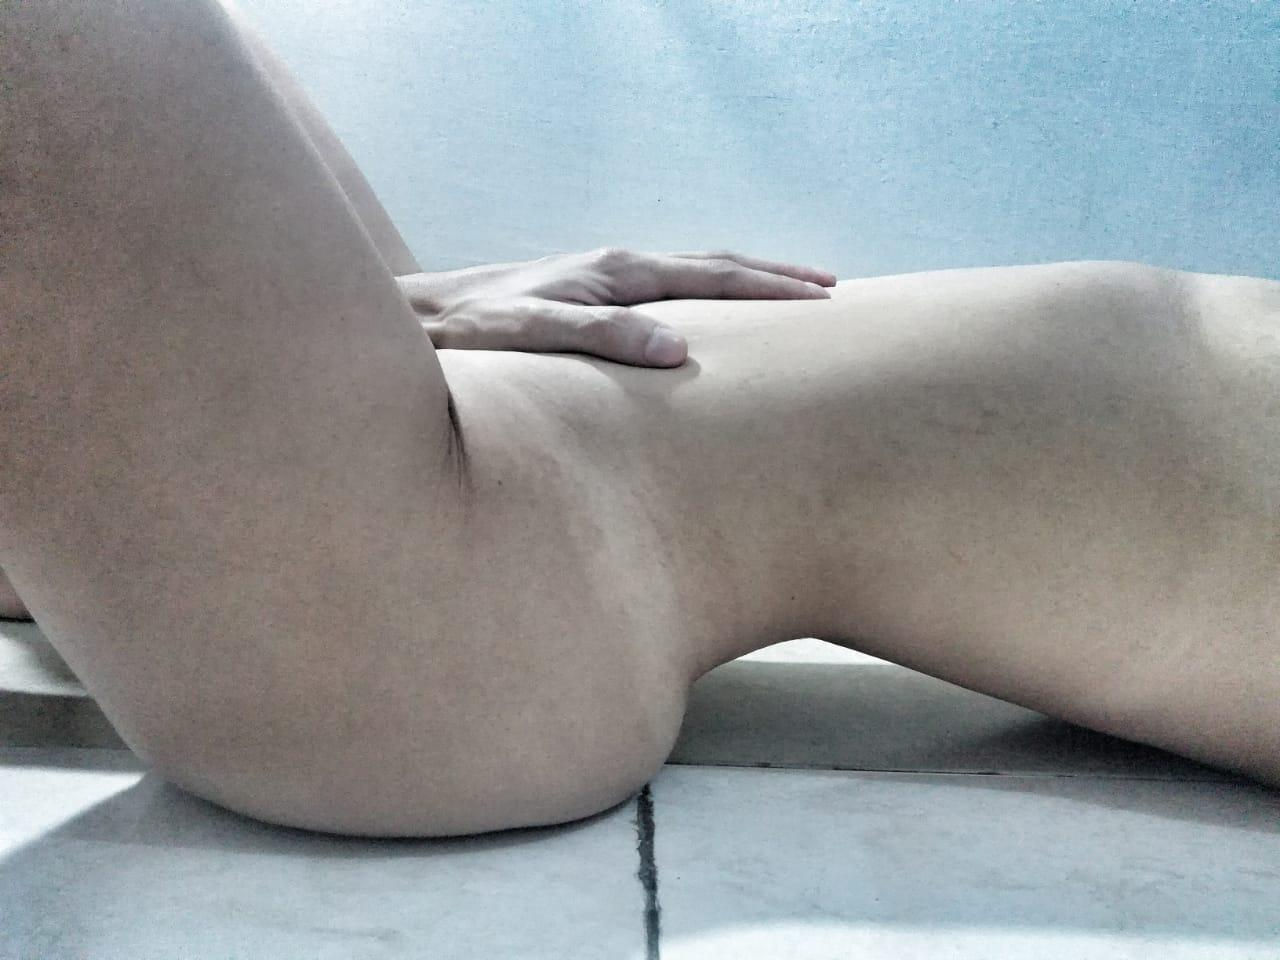 Sex horny?s=thwb6gzj7si9+6ppybpcbjwmtqeuhvsxt5jeytpxzlq=